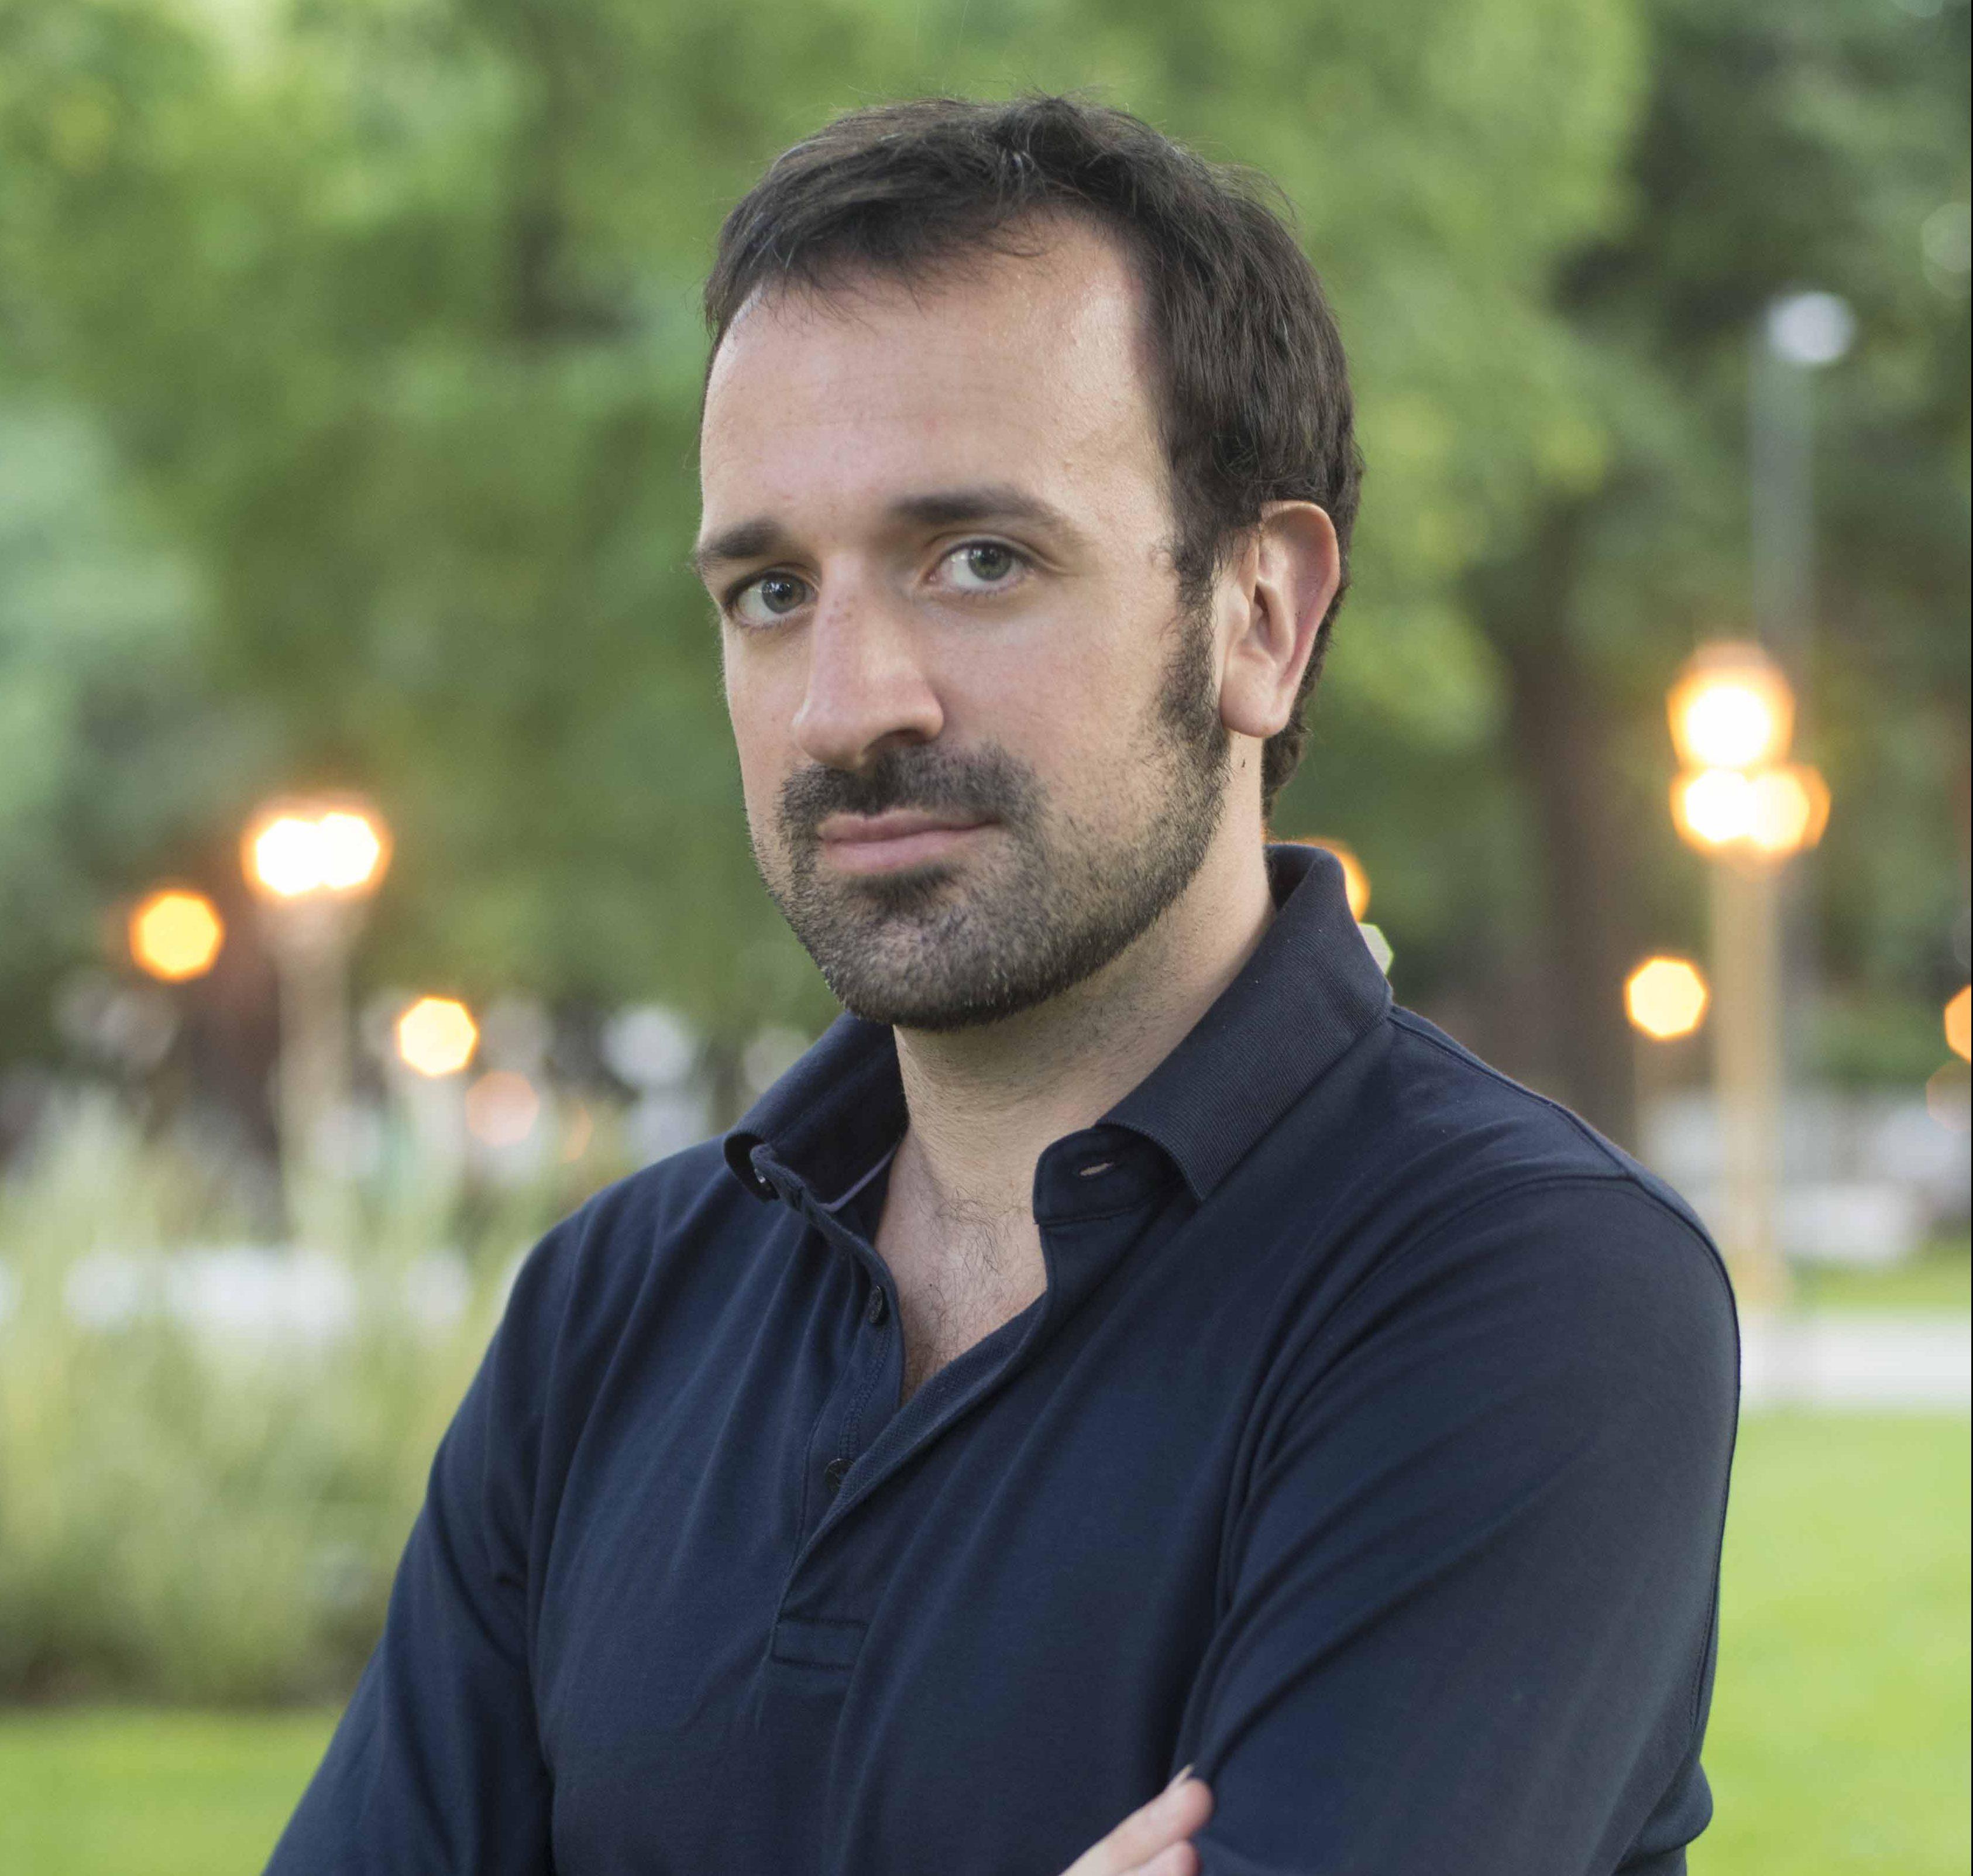 Juan Martín Miceli